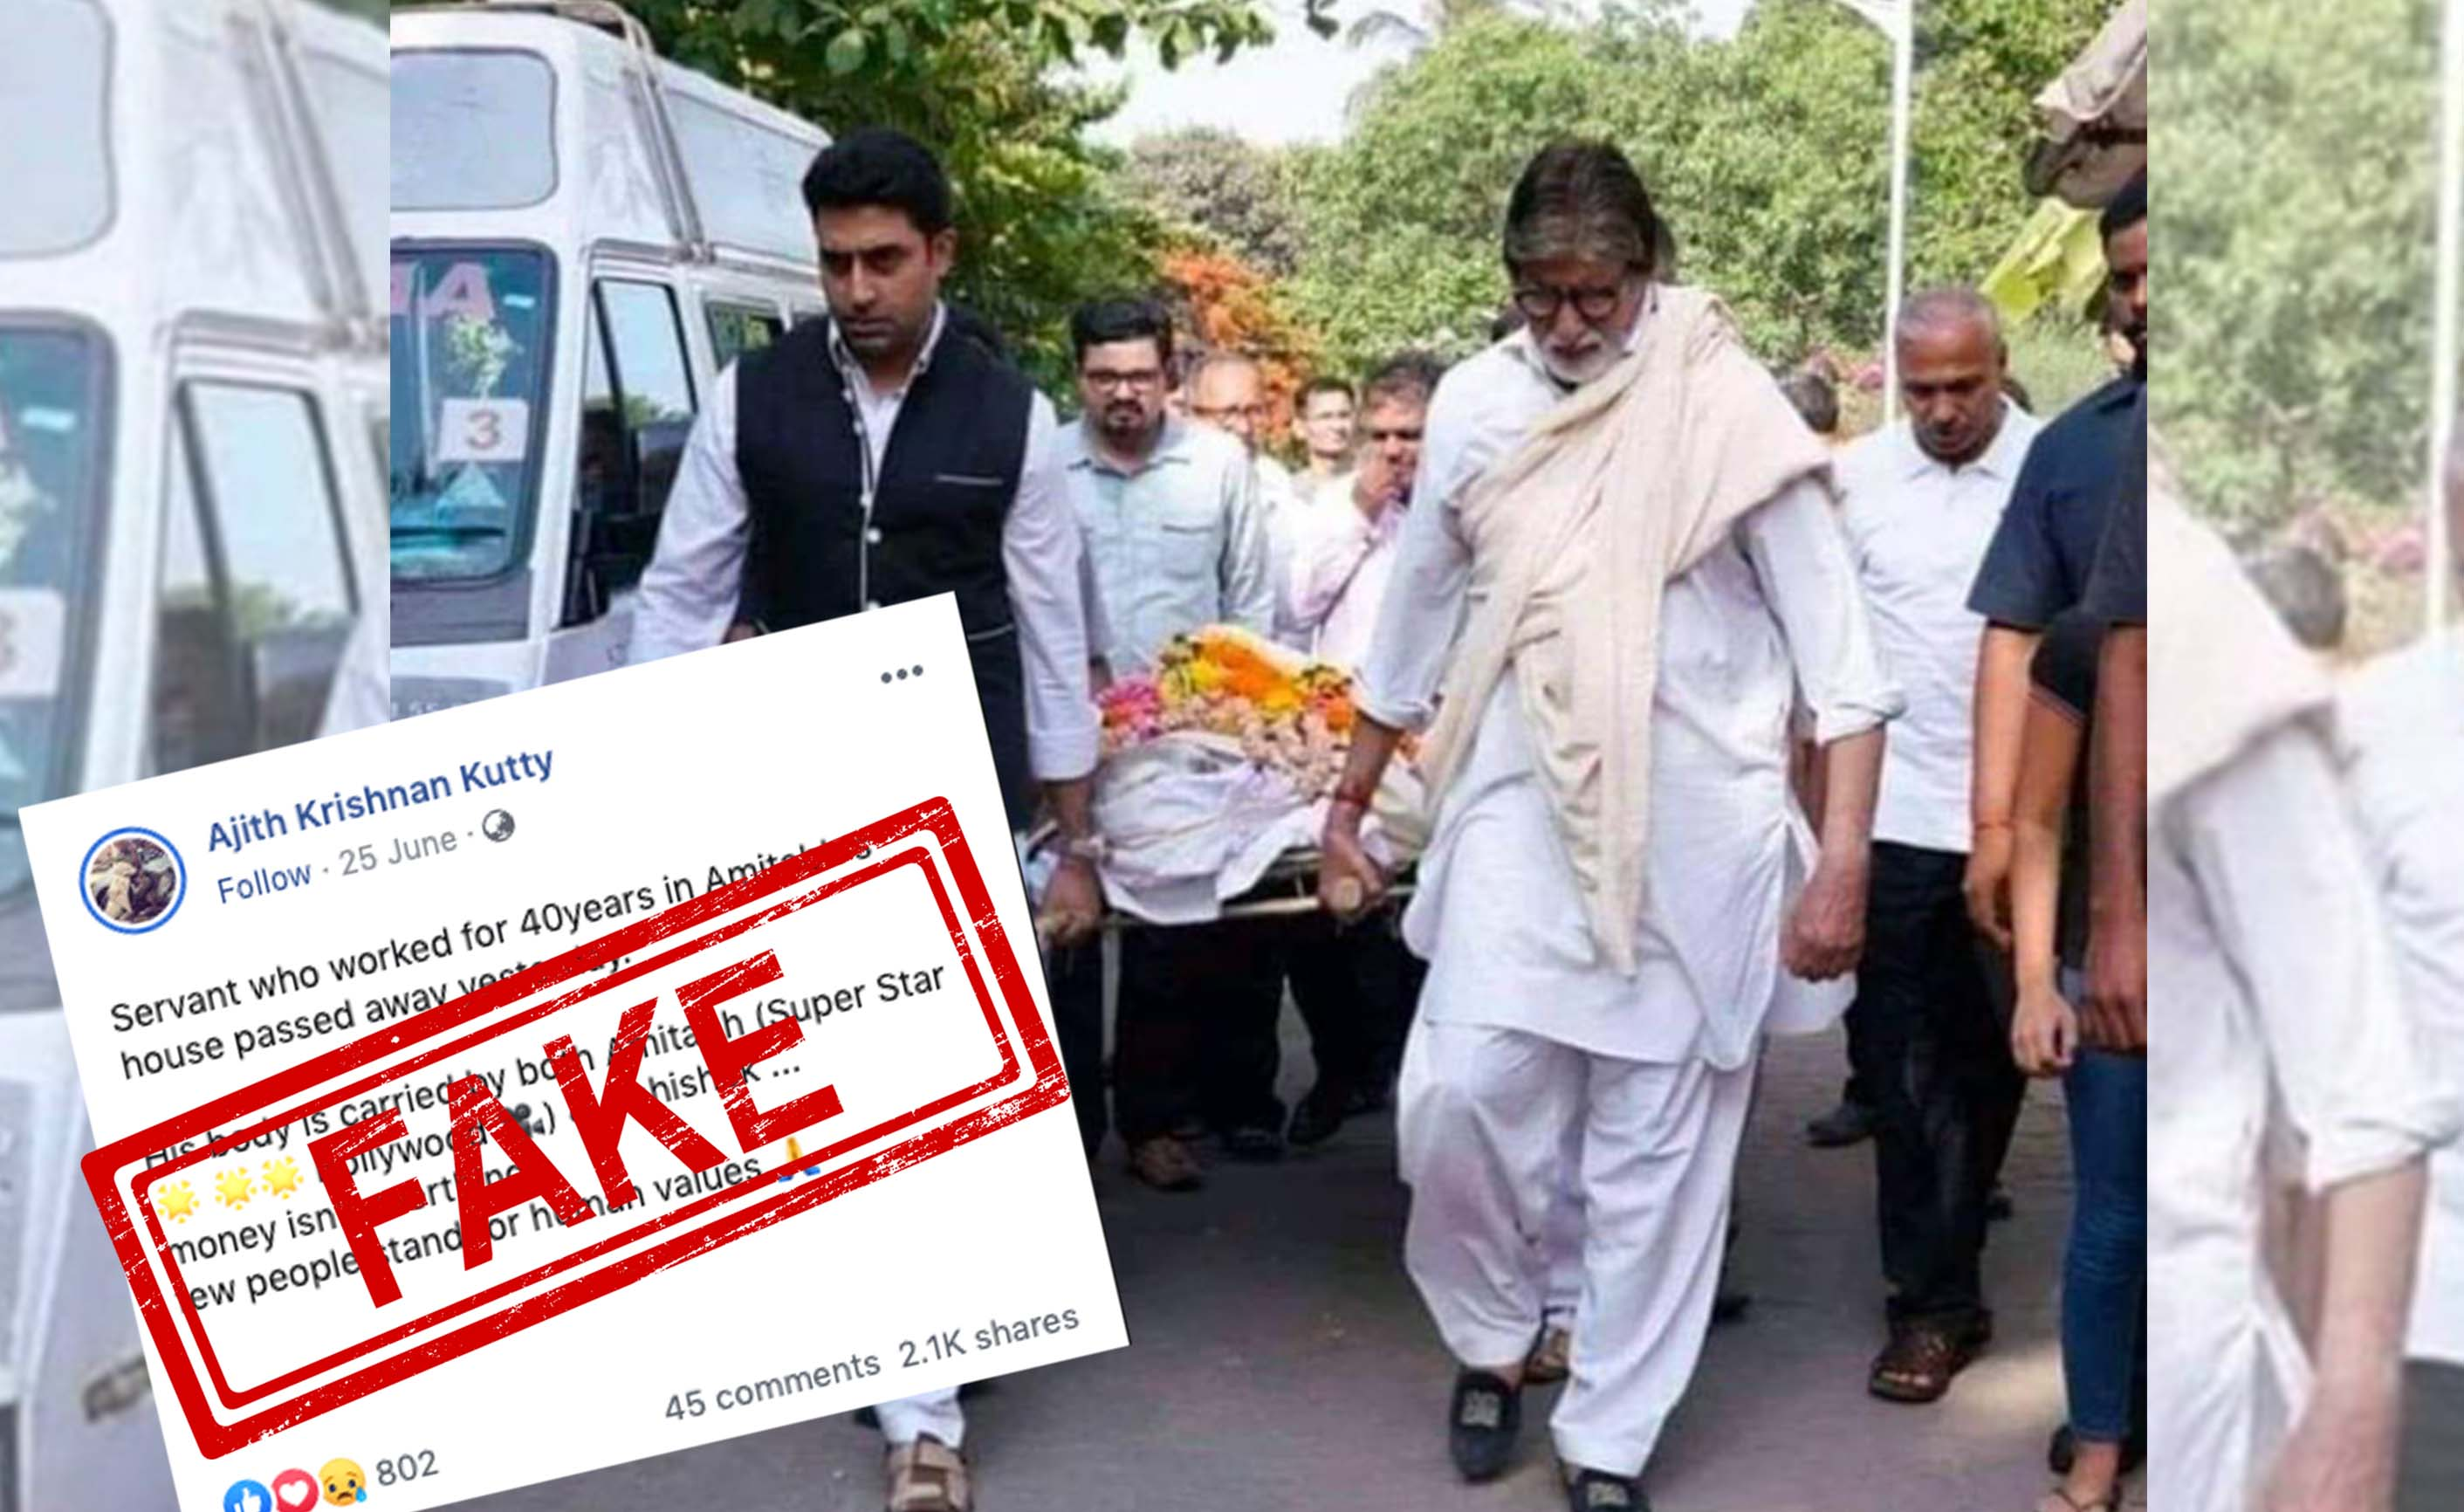 Amitabh Bachchan, Abhishek Bachchan, bier, Lift, Servant, Manager, Newsmobile, Mobile, News, India, Fake, Fact Check, Fact Checker